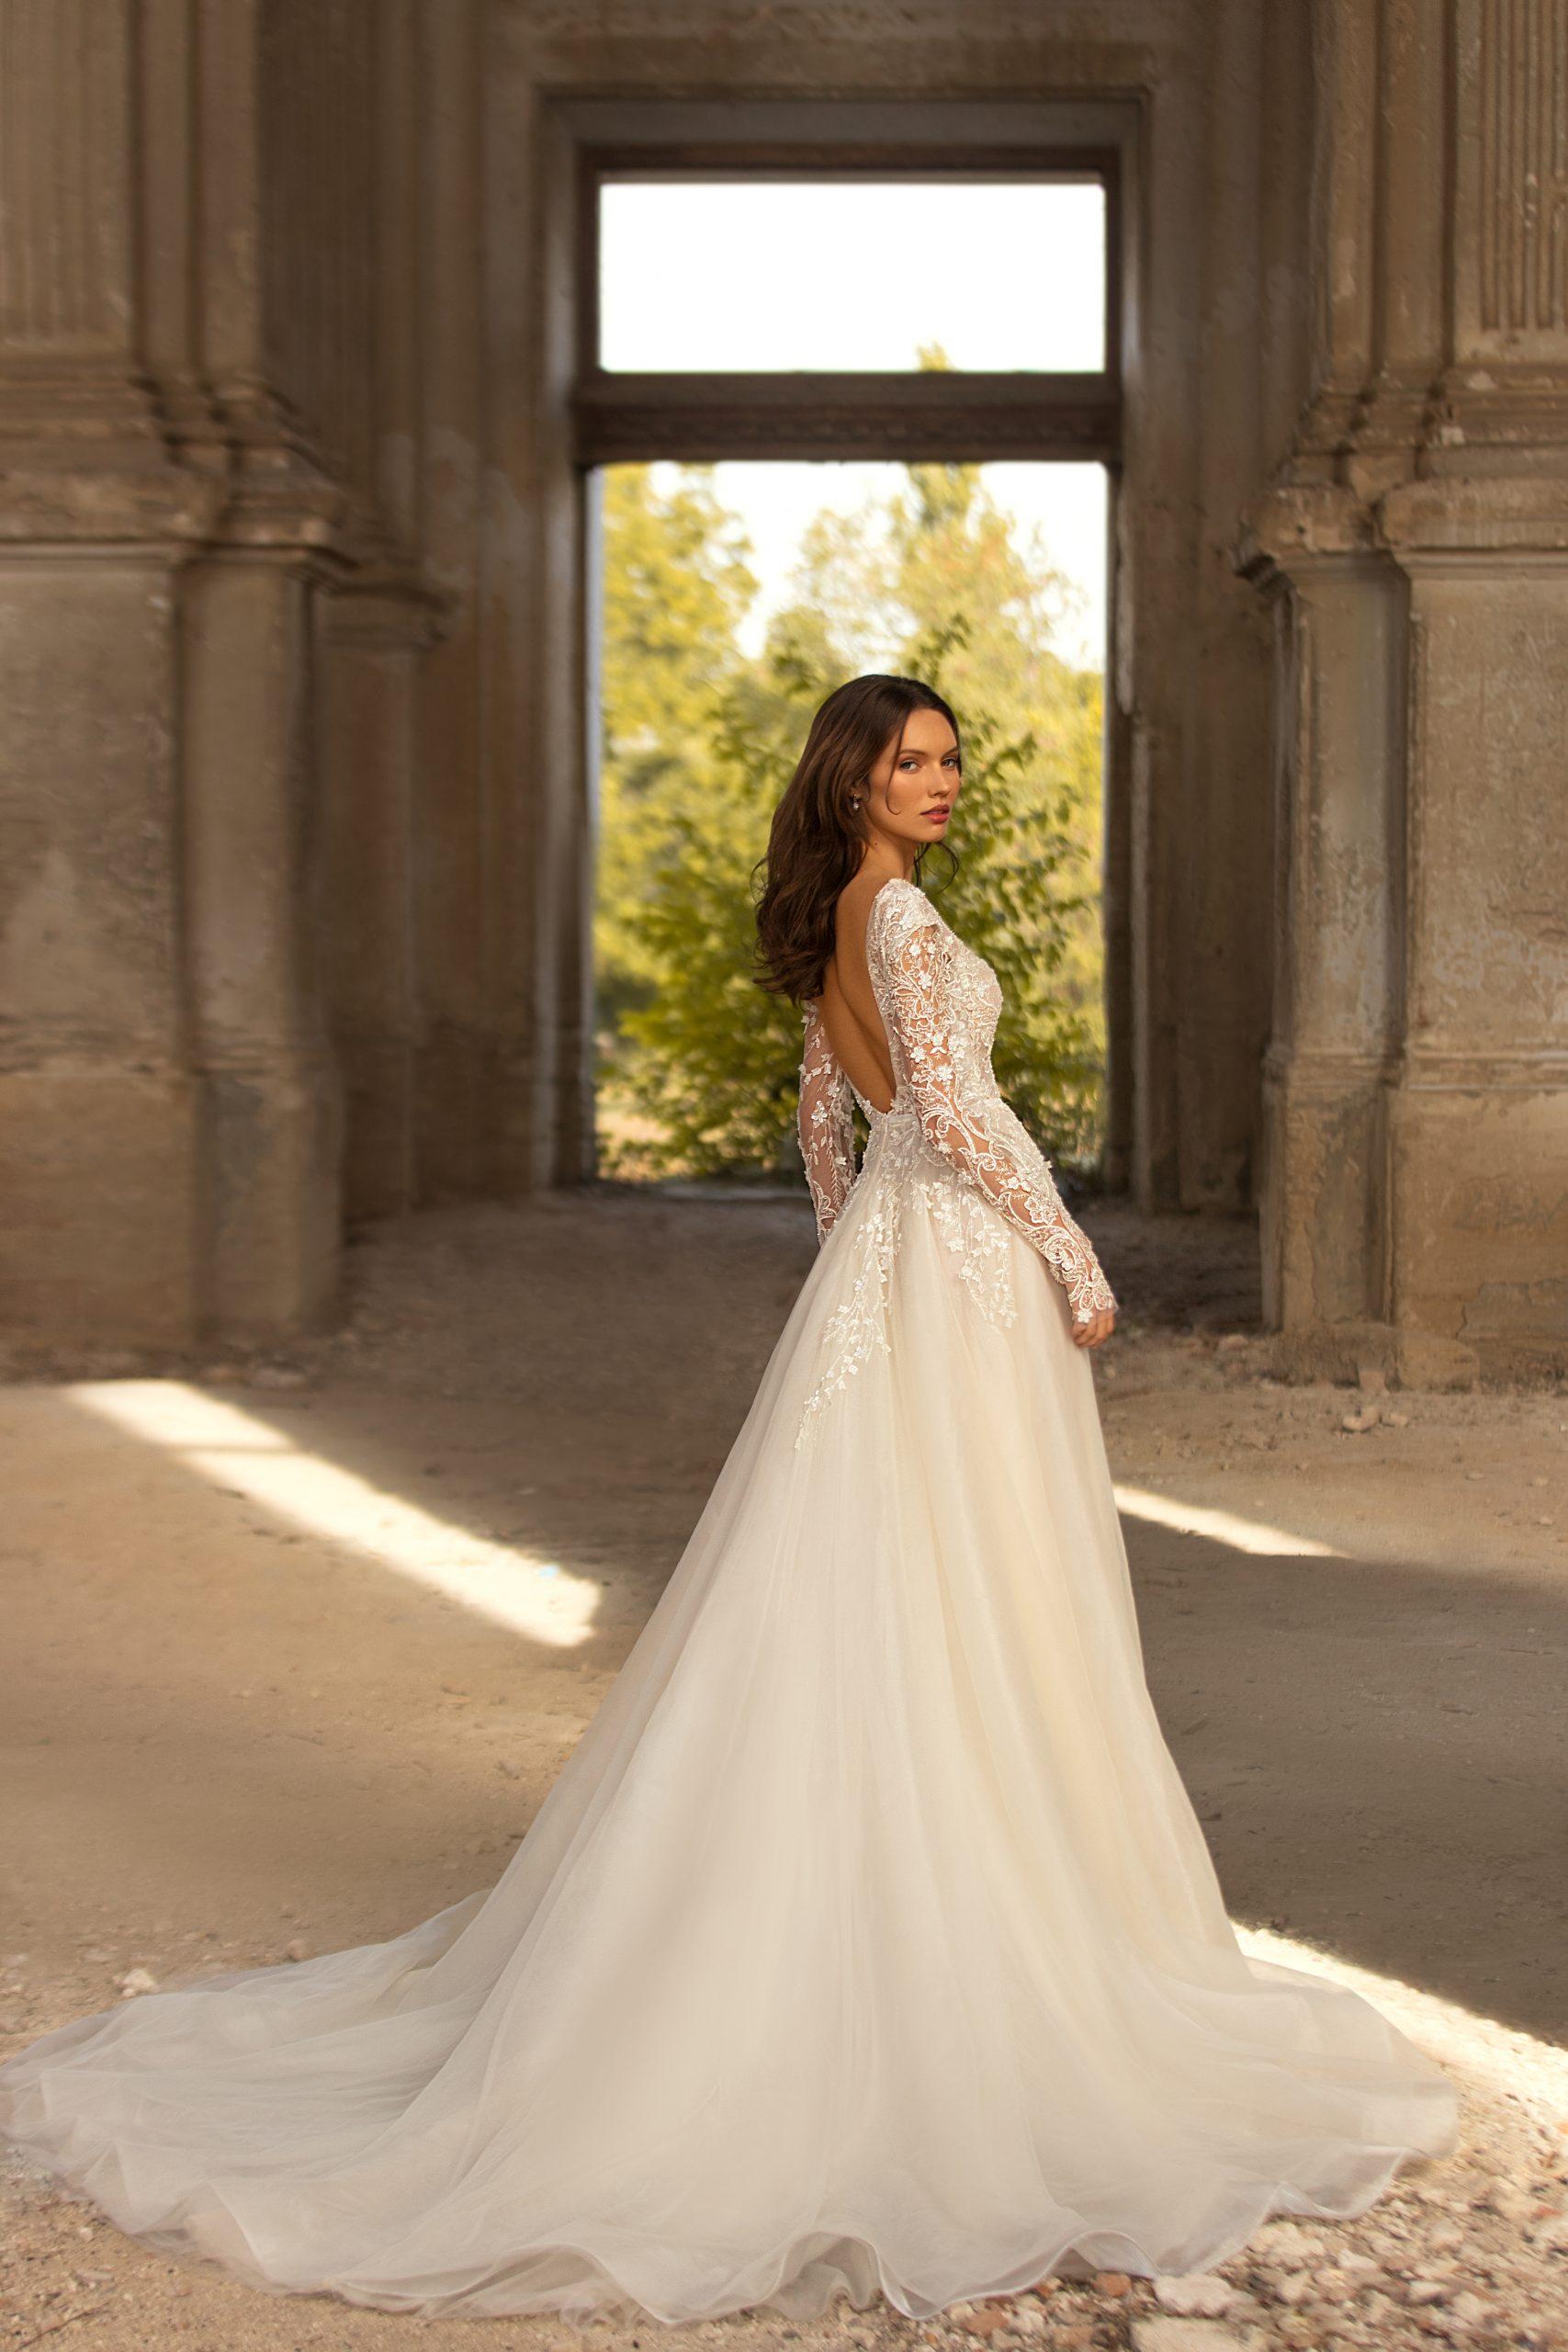 Florence wedding dress by Eva Lendel